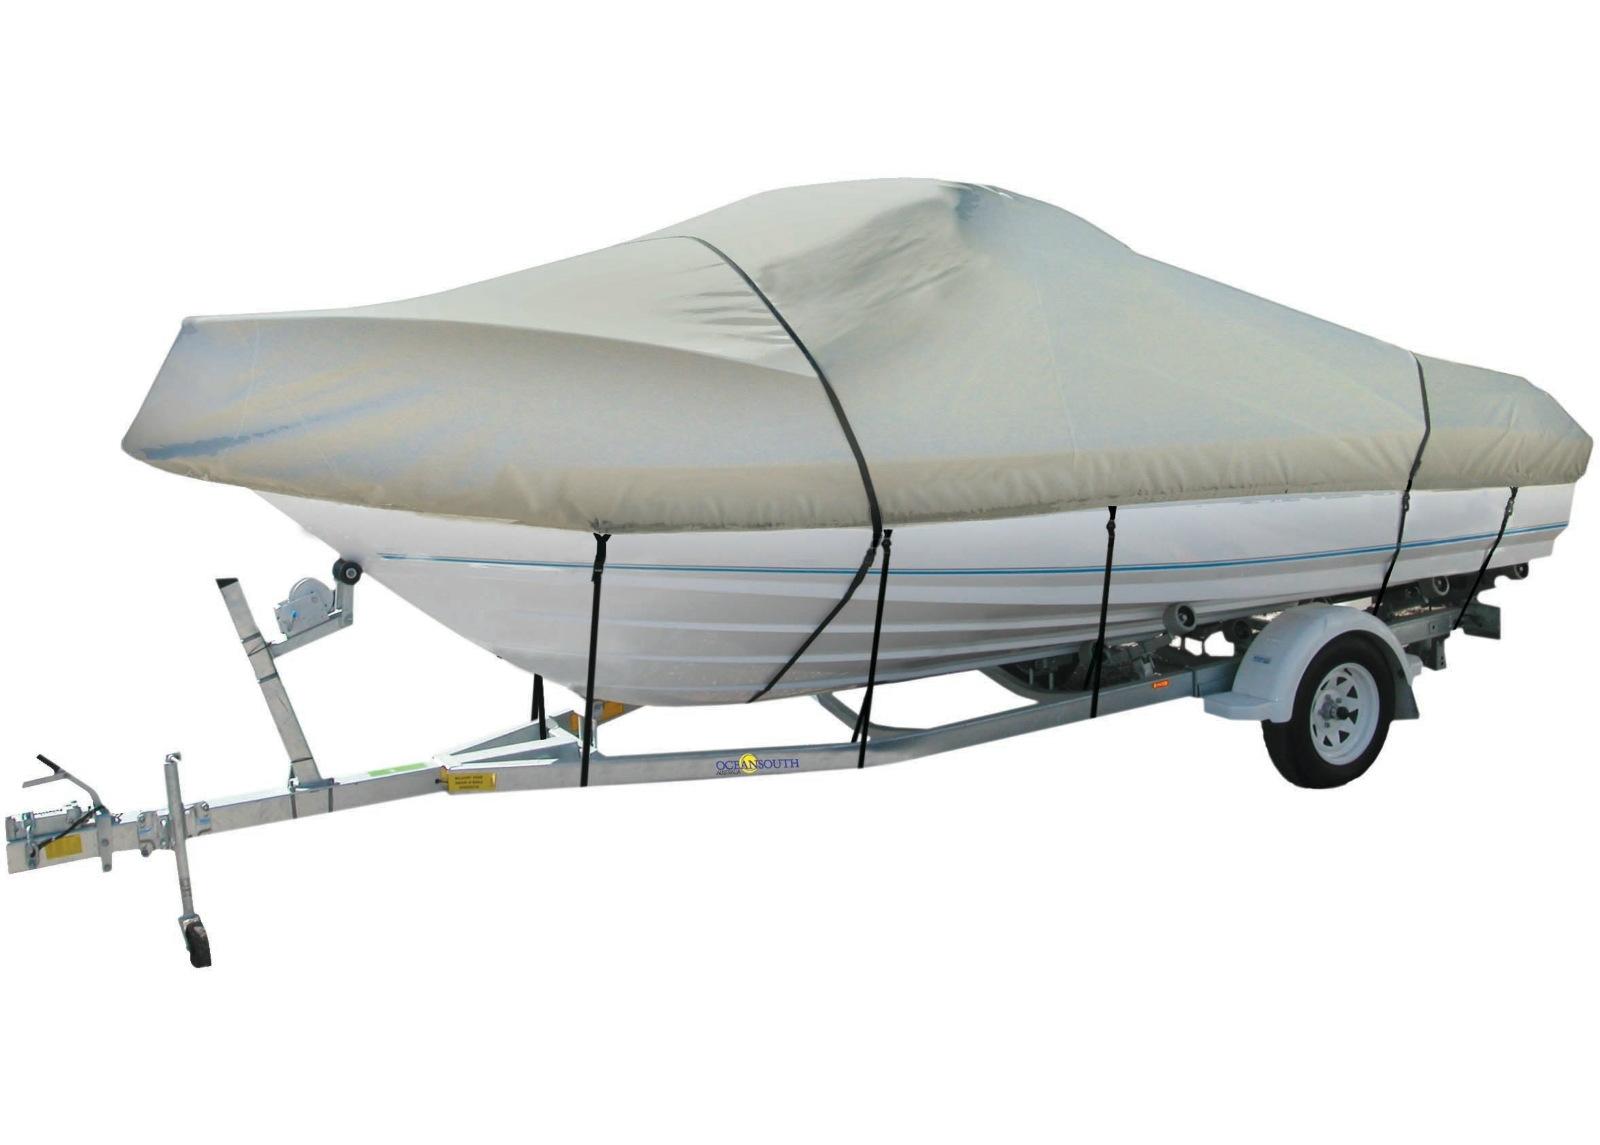 Venepeite Cabin Cruiser tyyppisille veneille 4.7-5.0 m